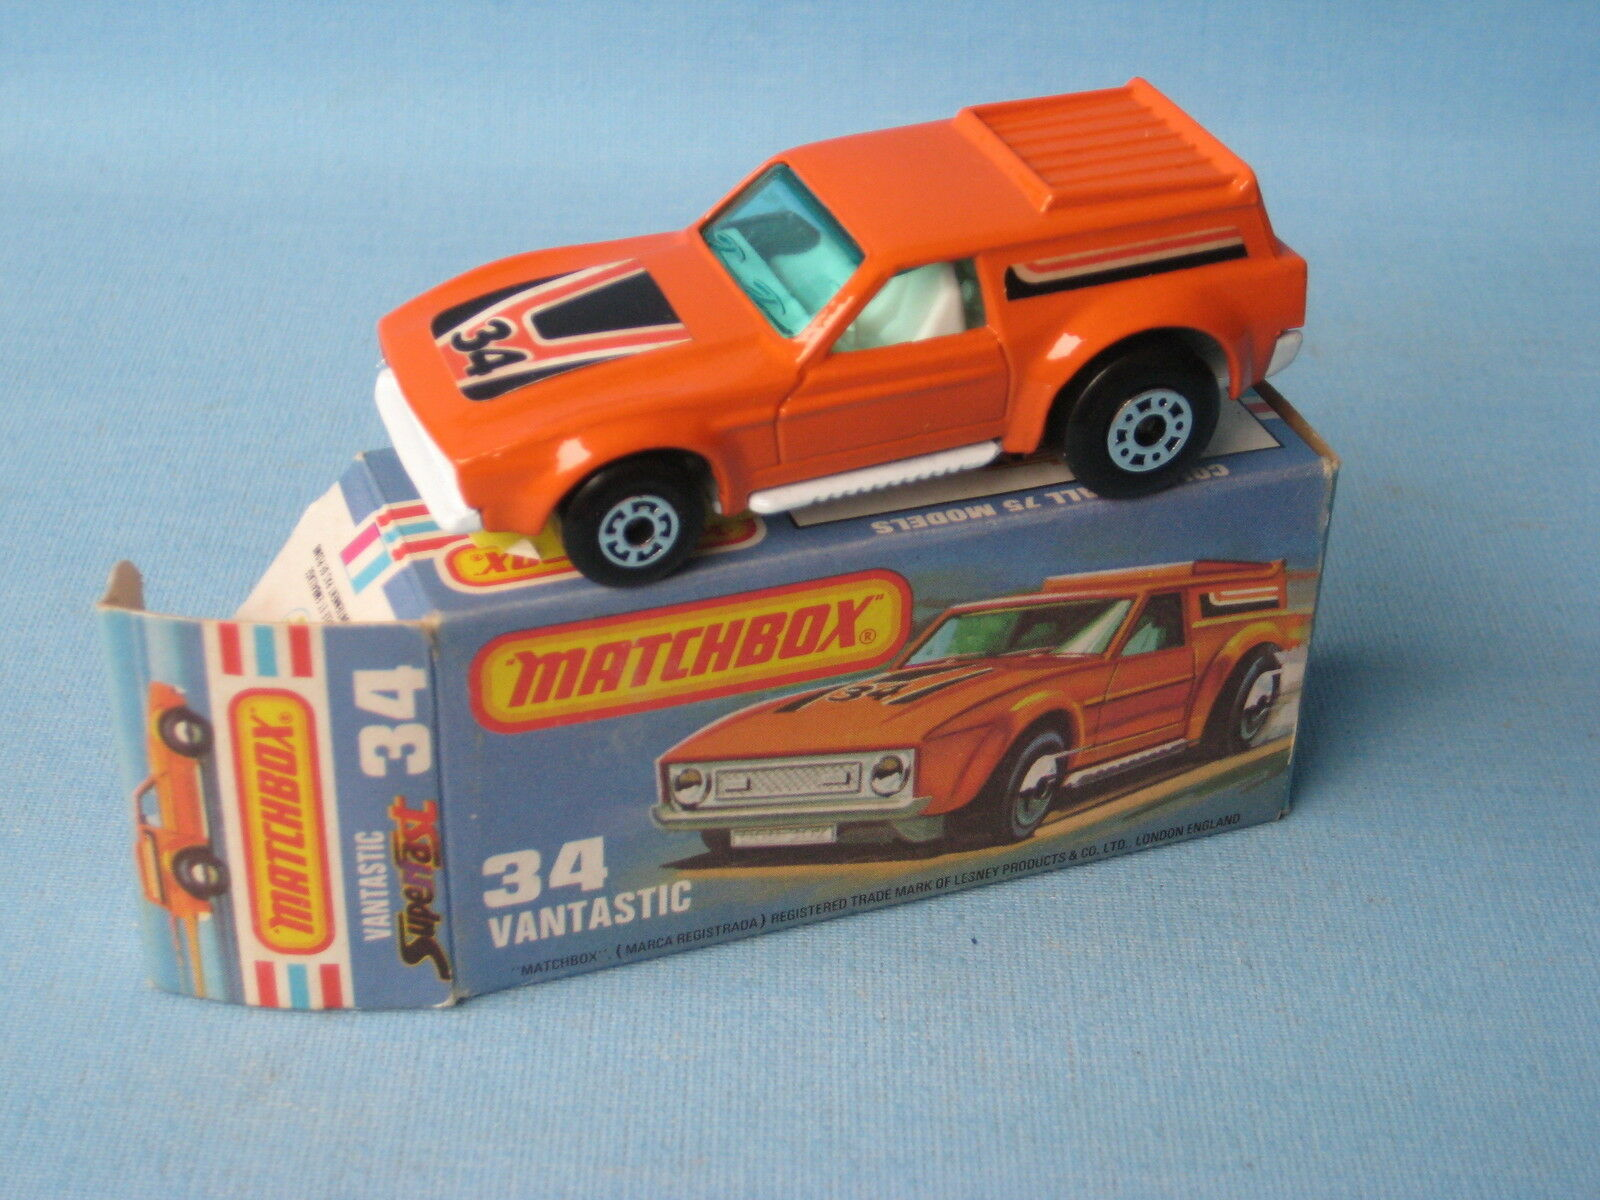 Lesney Matchbox Superfast 34 Vantastic Mustang Stripes Labels Boxed